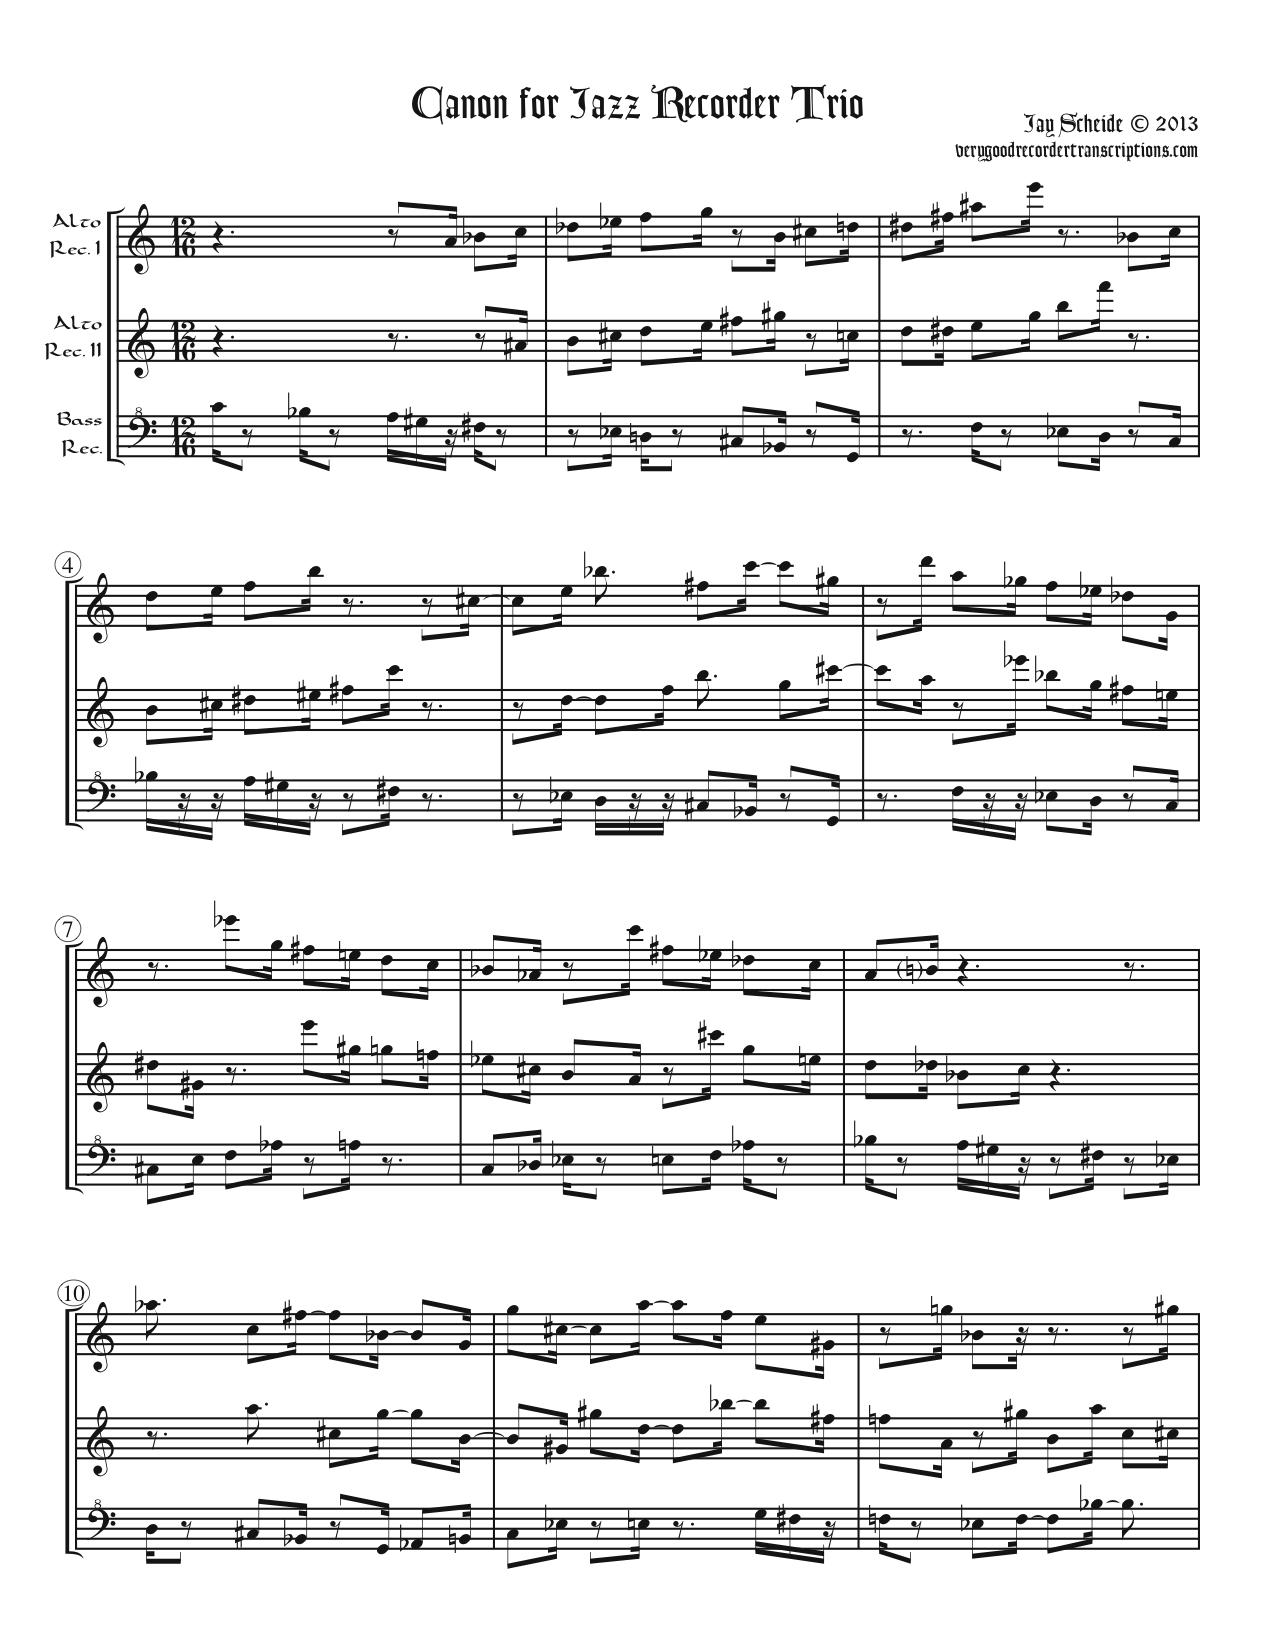 Jazz Canon for Recorder Trio